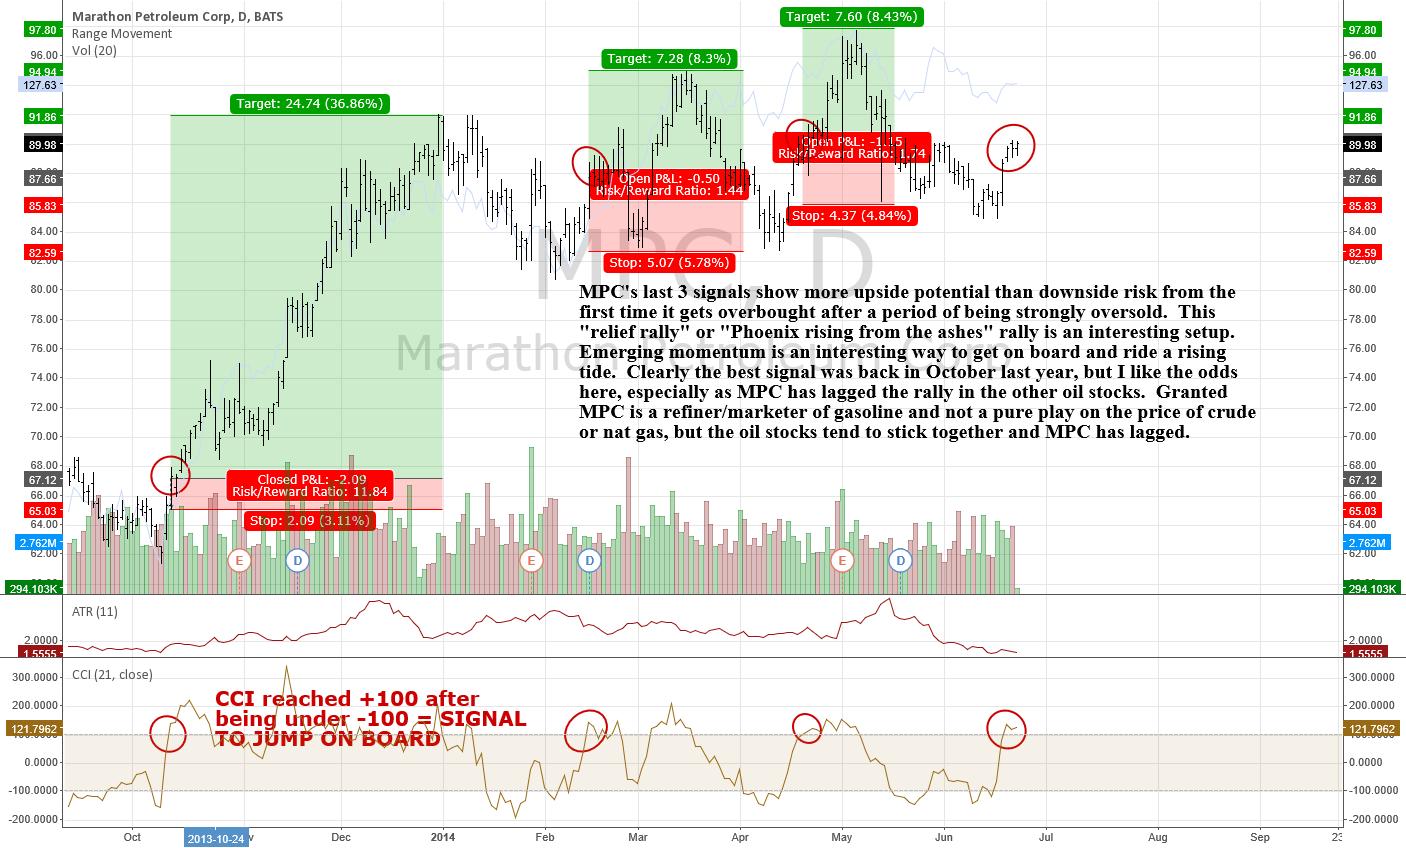 Marathon Petroleum Corp MPC Daily - CCI +100 = BUY SIGNAL